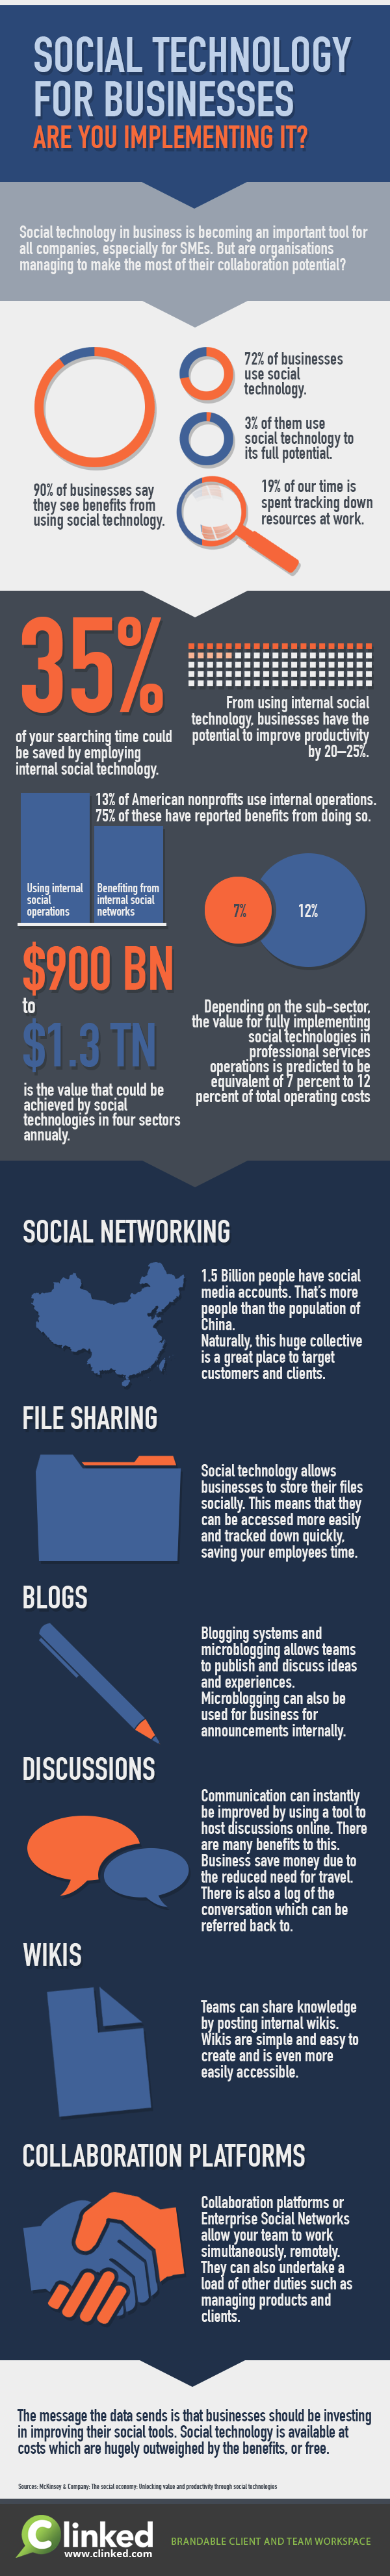 social technology for businesses